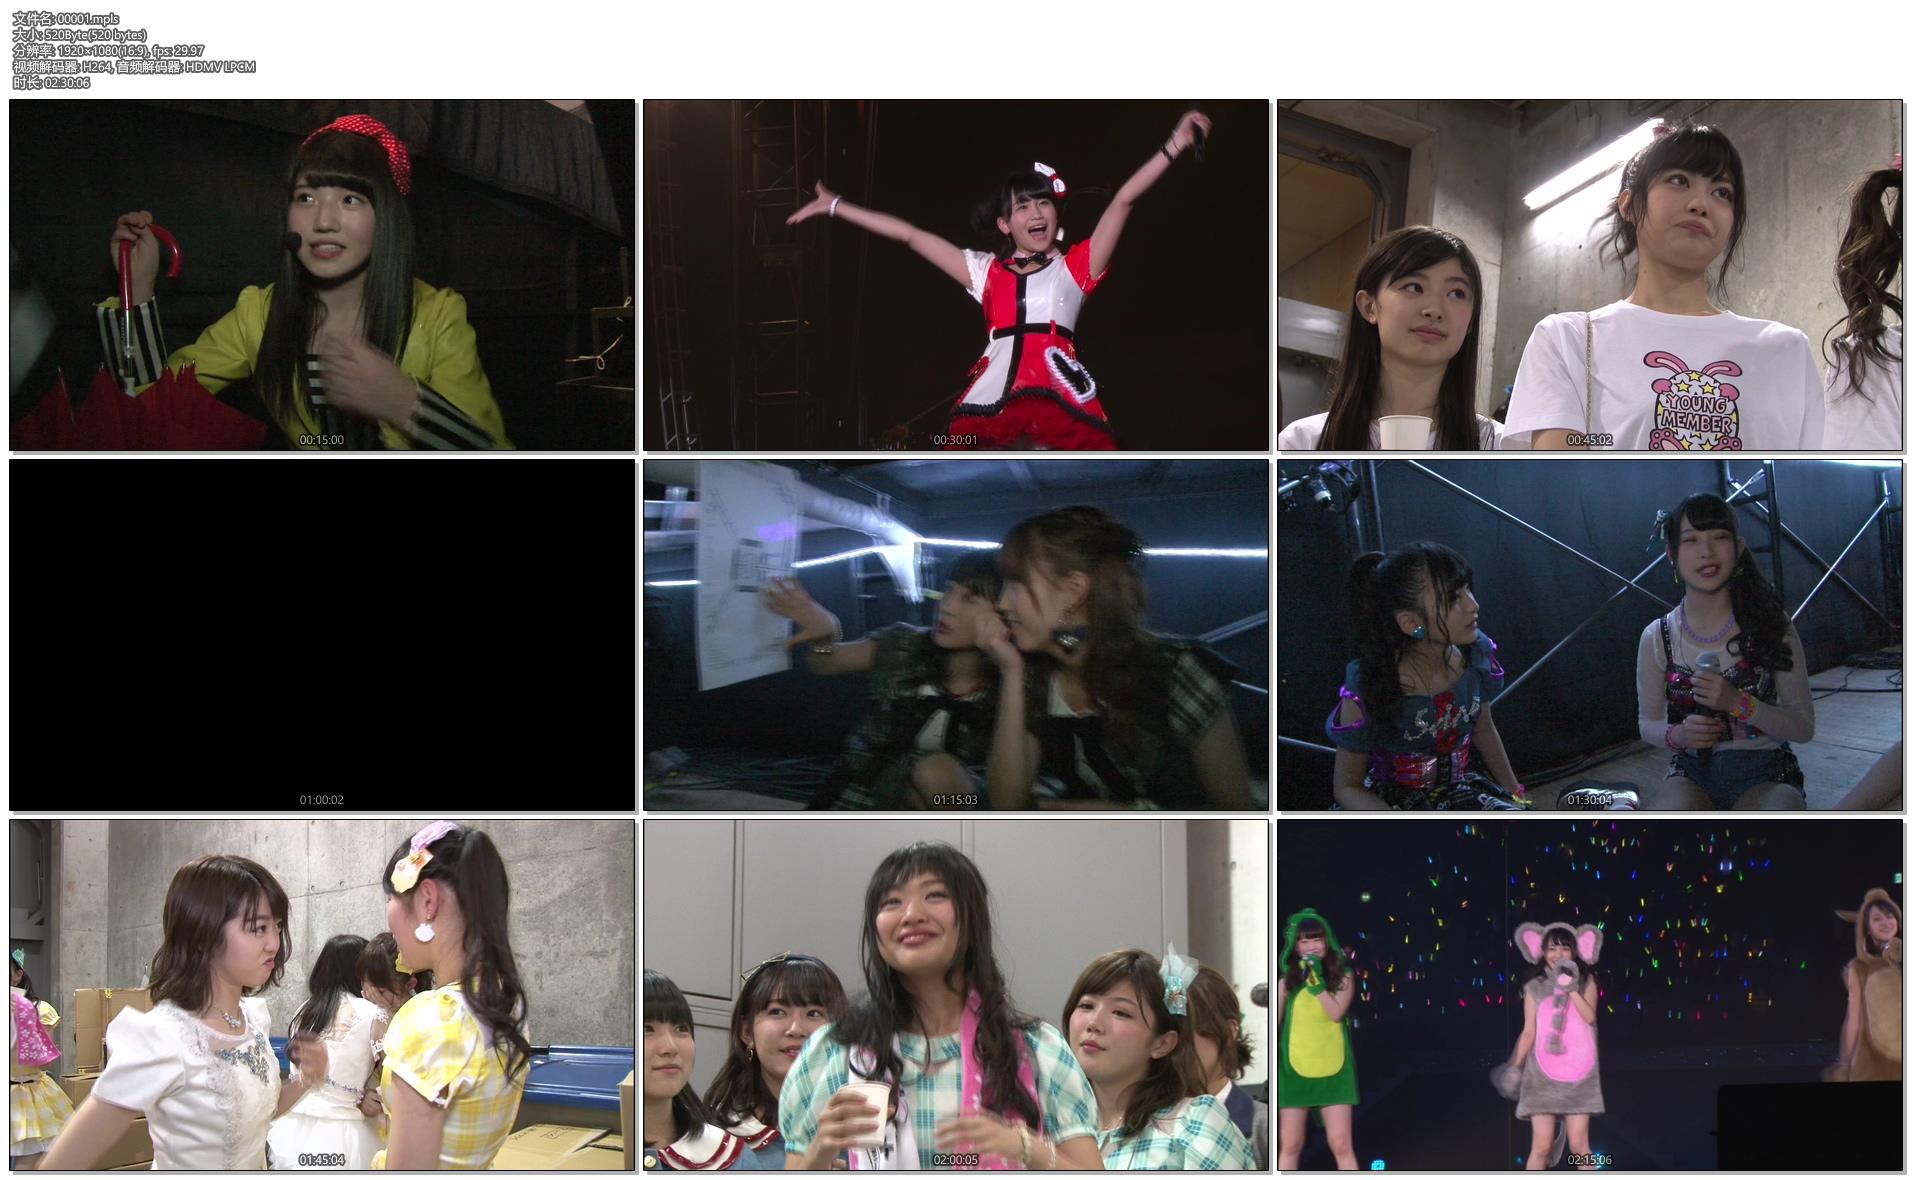 AKB48 2015年春季巡回演唱会AKB48ヤングメンバー全国ツアー/春の単独コンサート《BDMV4碟 120G》蓝光原盘插图(4)